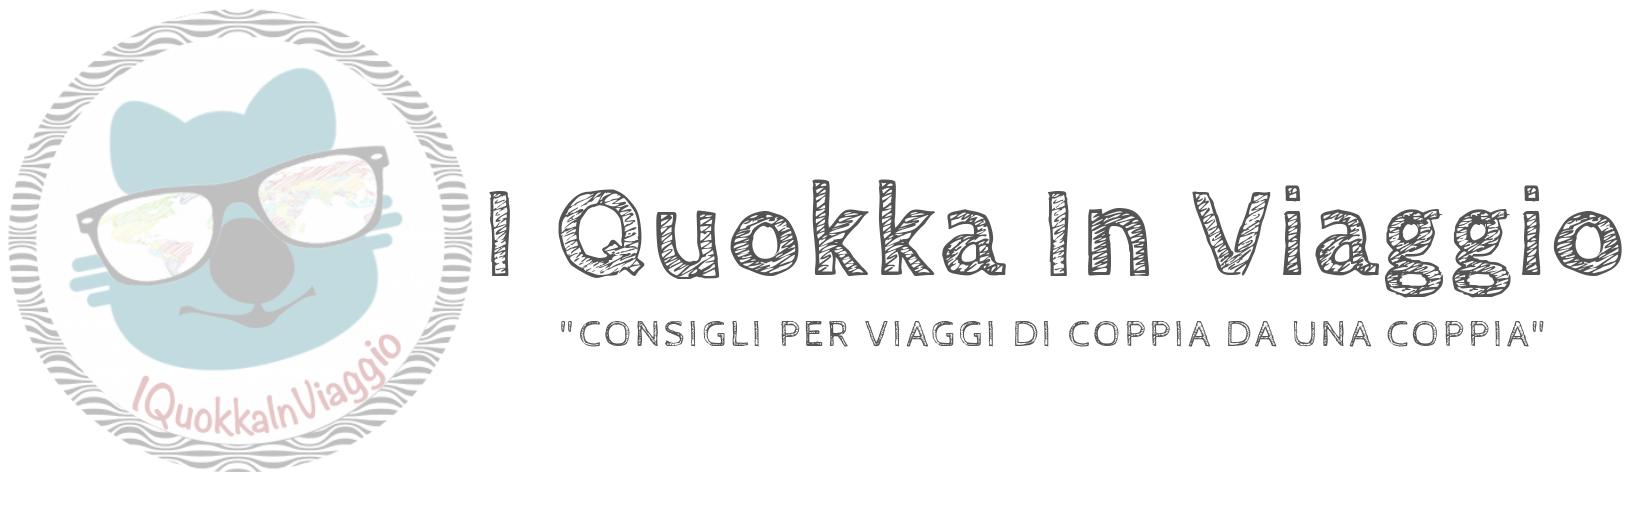 I Quokka In Viaggio